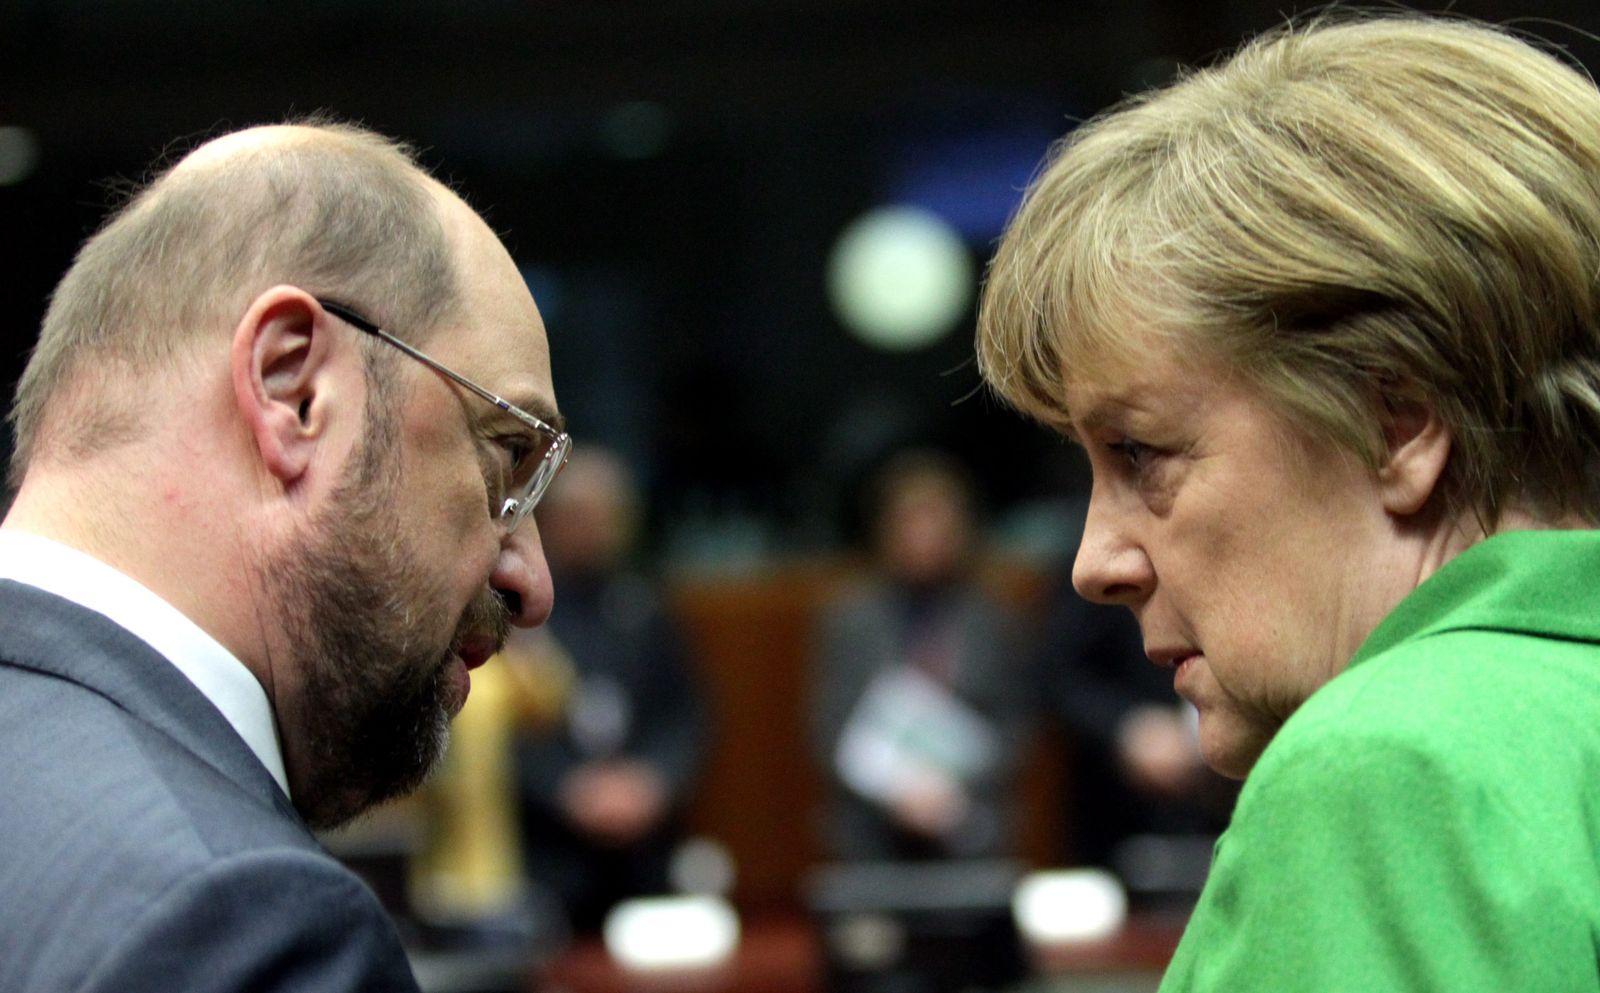 SPIN 44/2013 pp28 Merkel in Brüssel; Merkel, Schulz